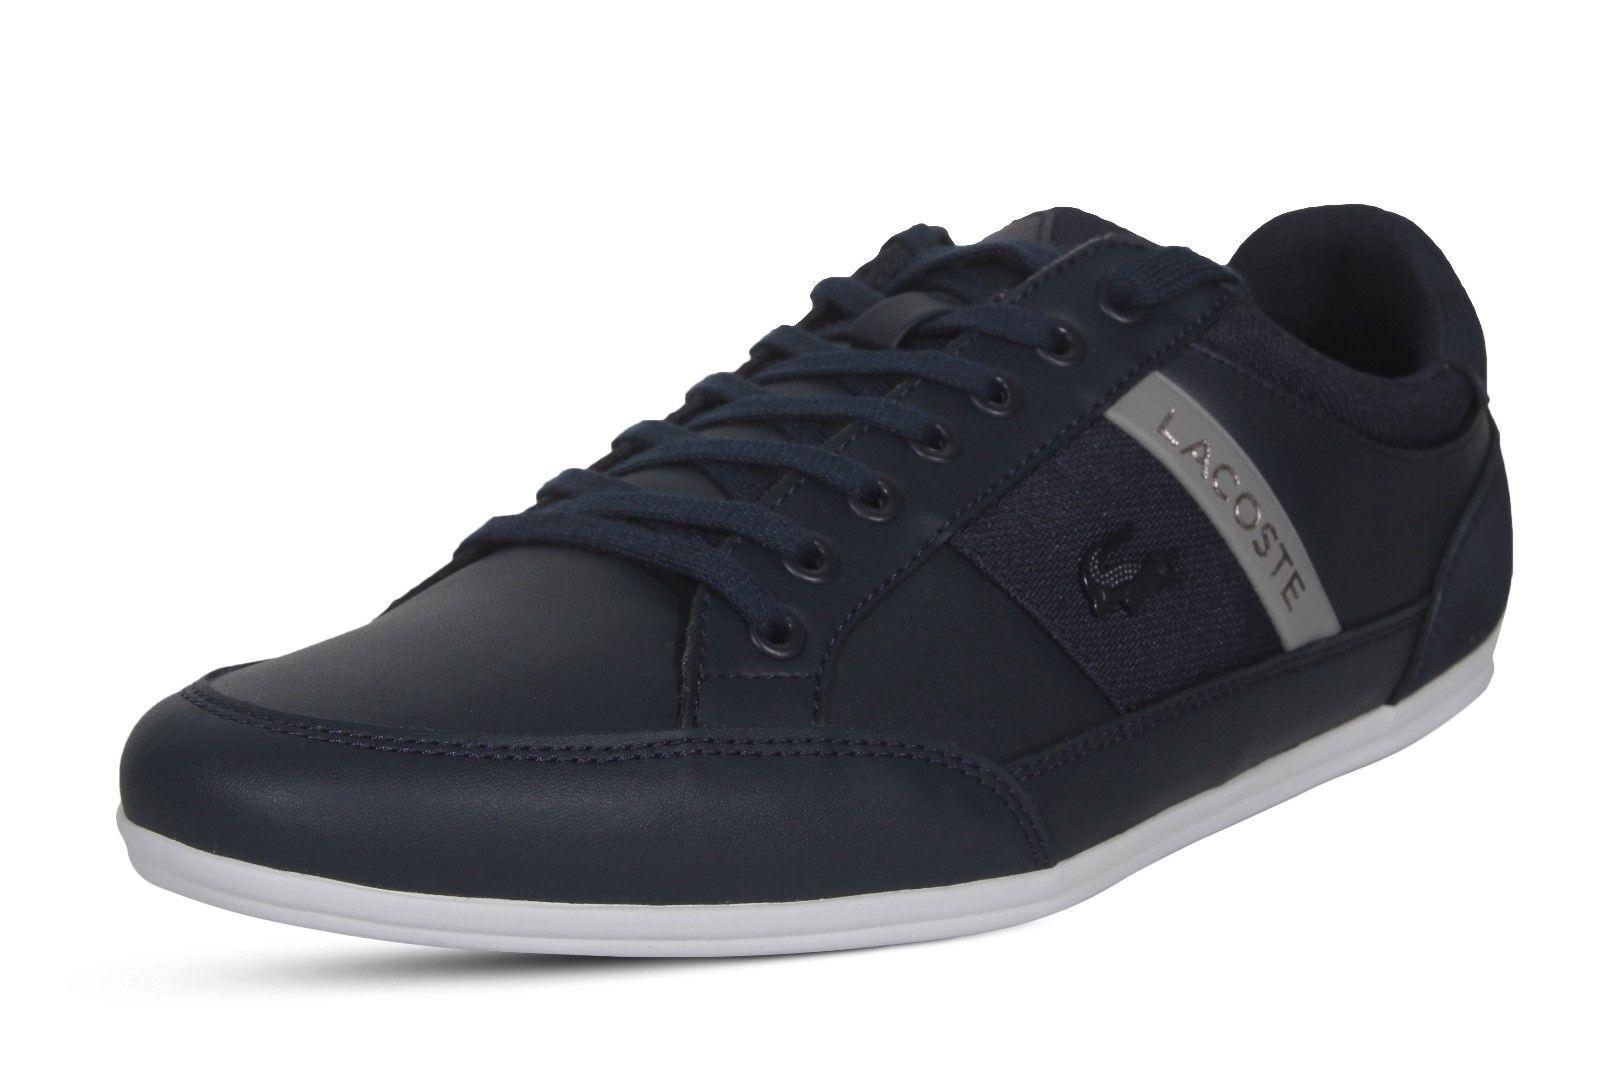 Lacoste scarpe da ginnastica Chaymon 318 318 318 3 US CAM Casual Fashion scarpe Leather Lace Up Navy 9b5752